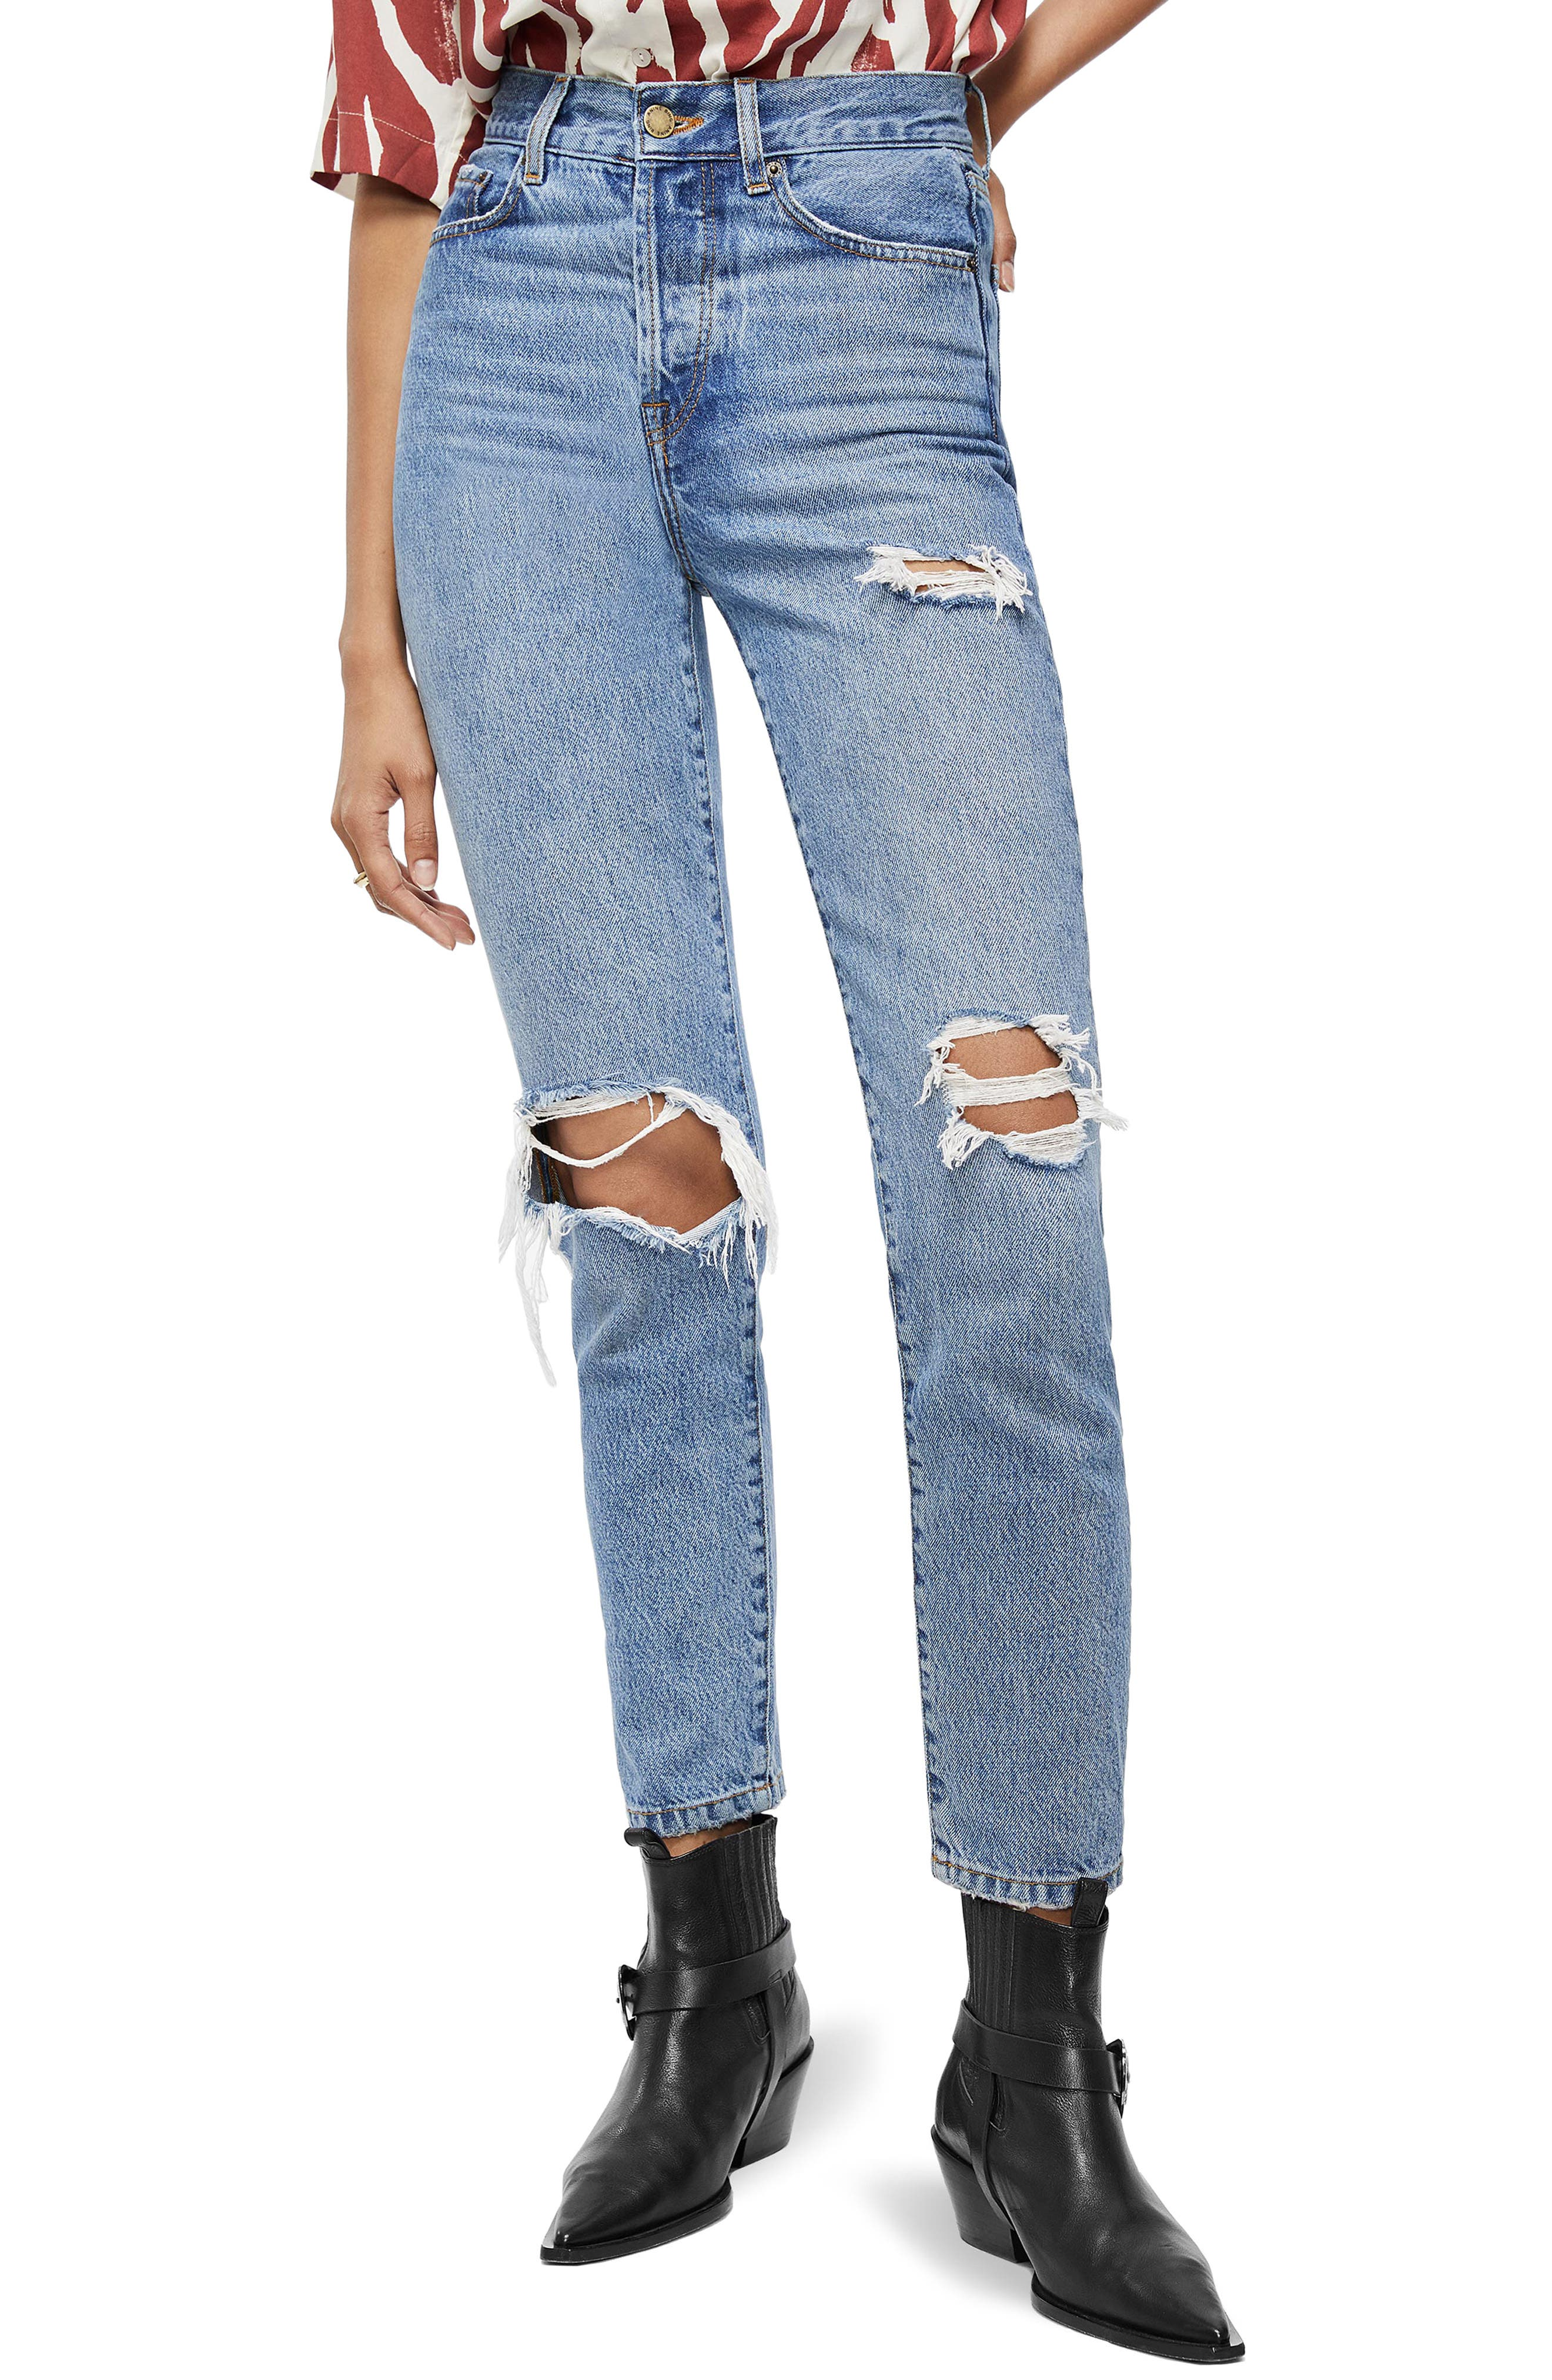 7cebb31cef3 Women's ANINE BING Jeans & Denim   Nordstrom